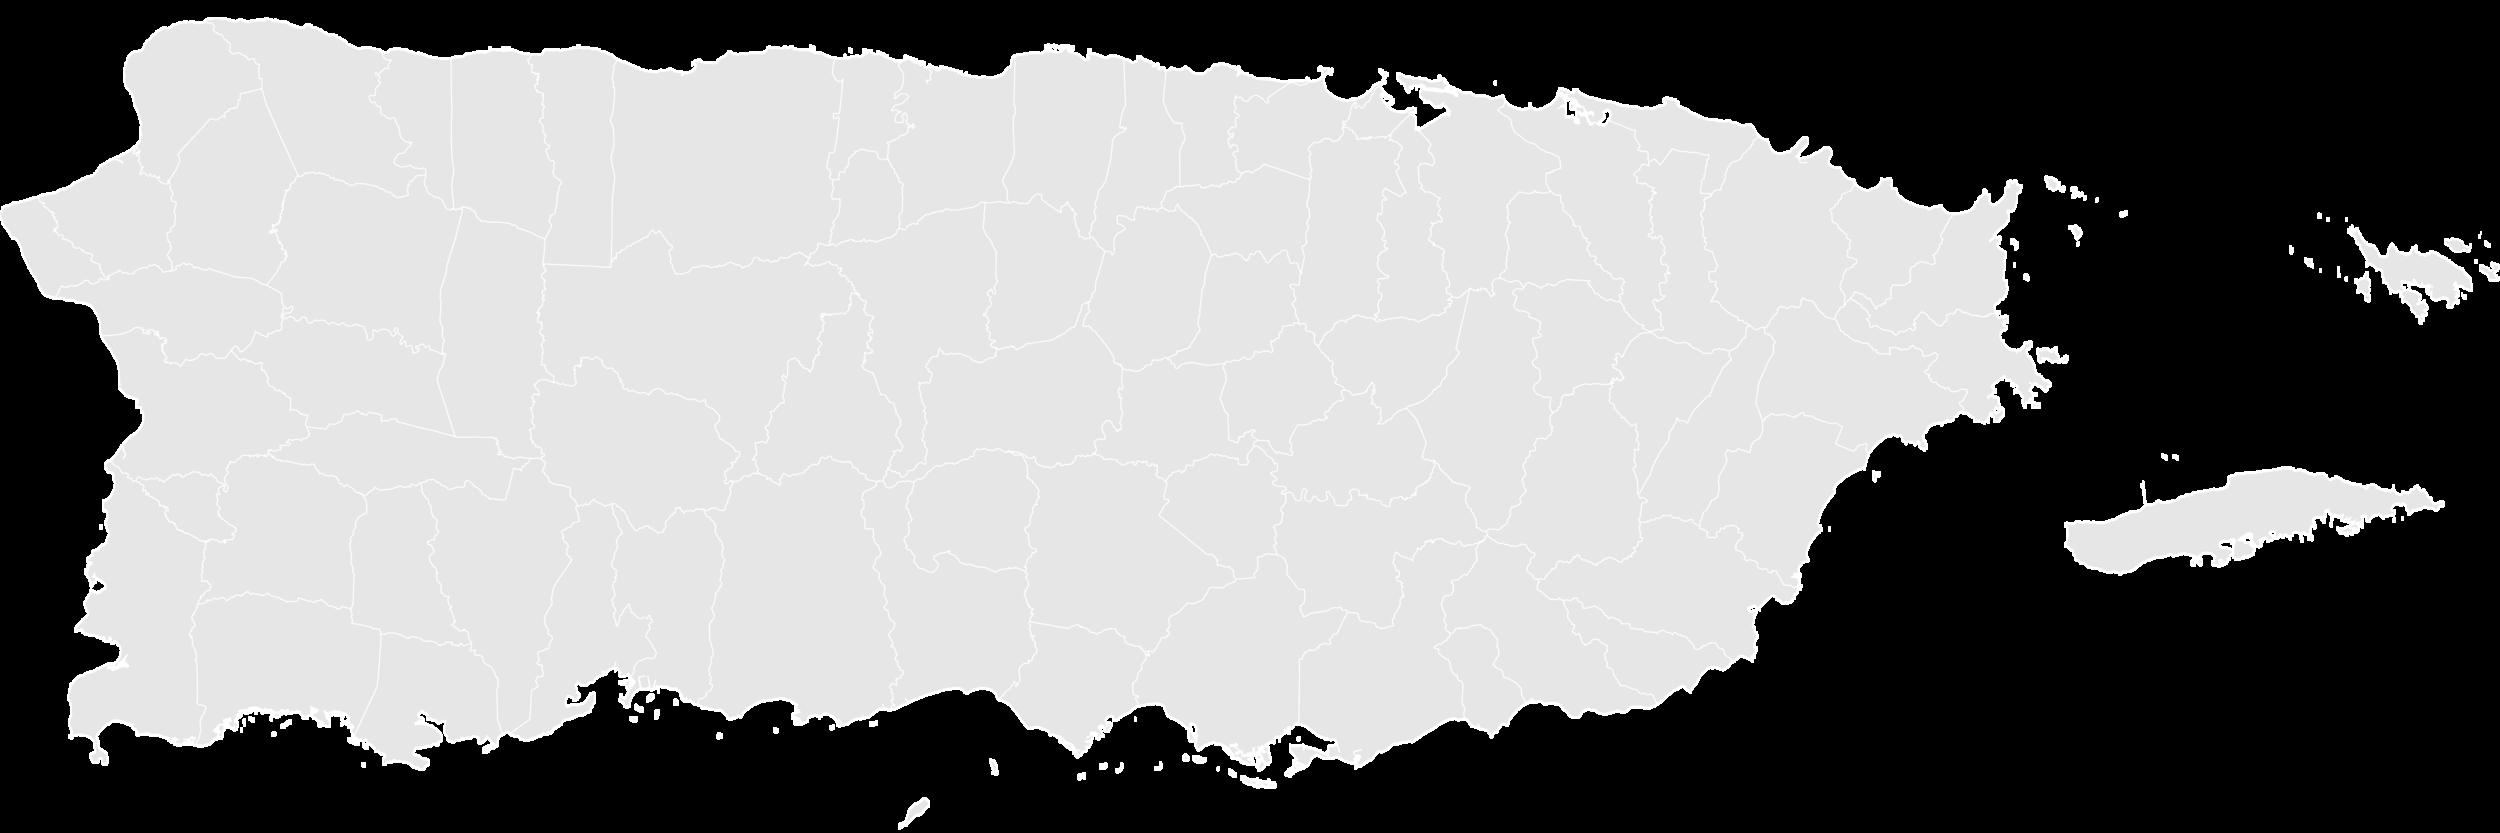 PR_Map-01.png